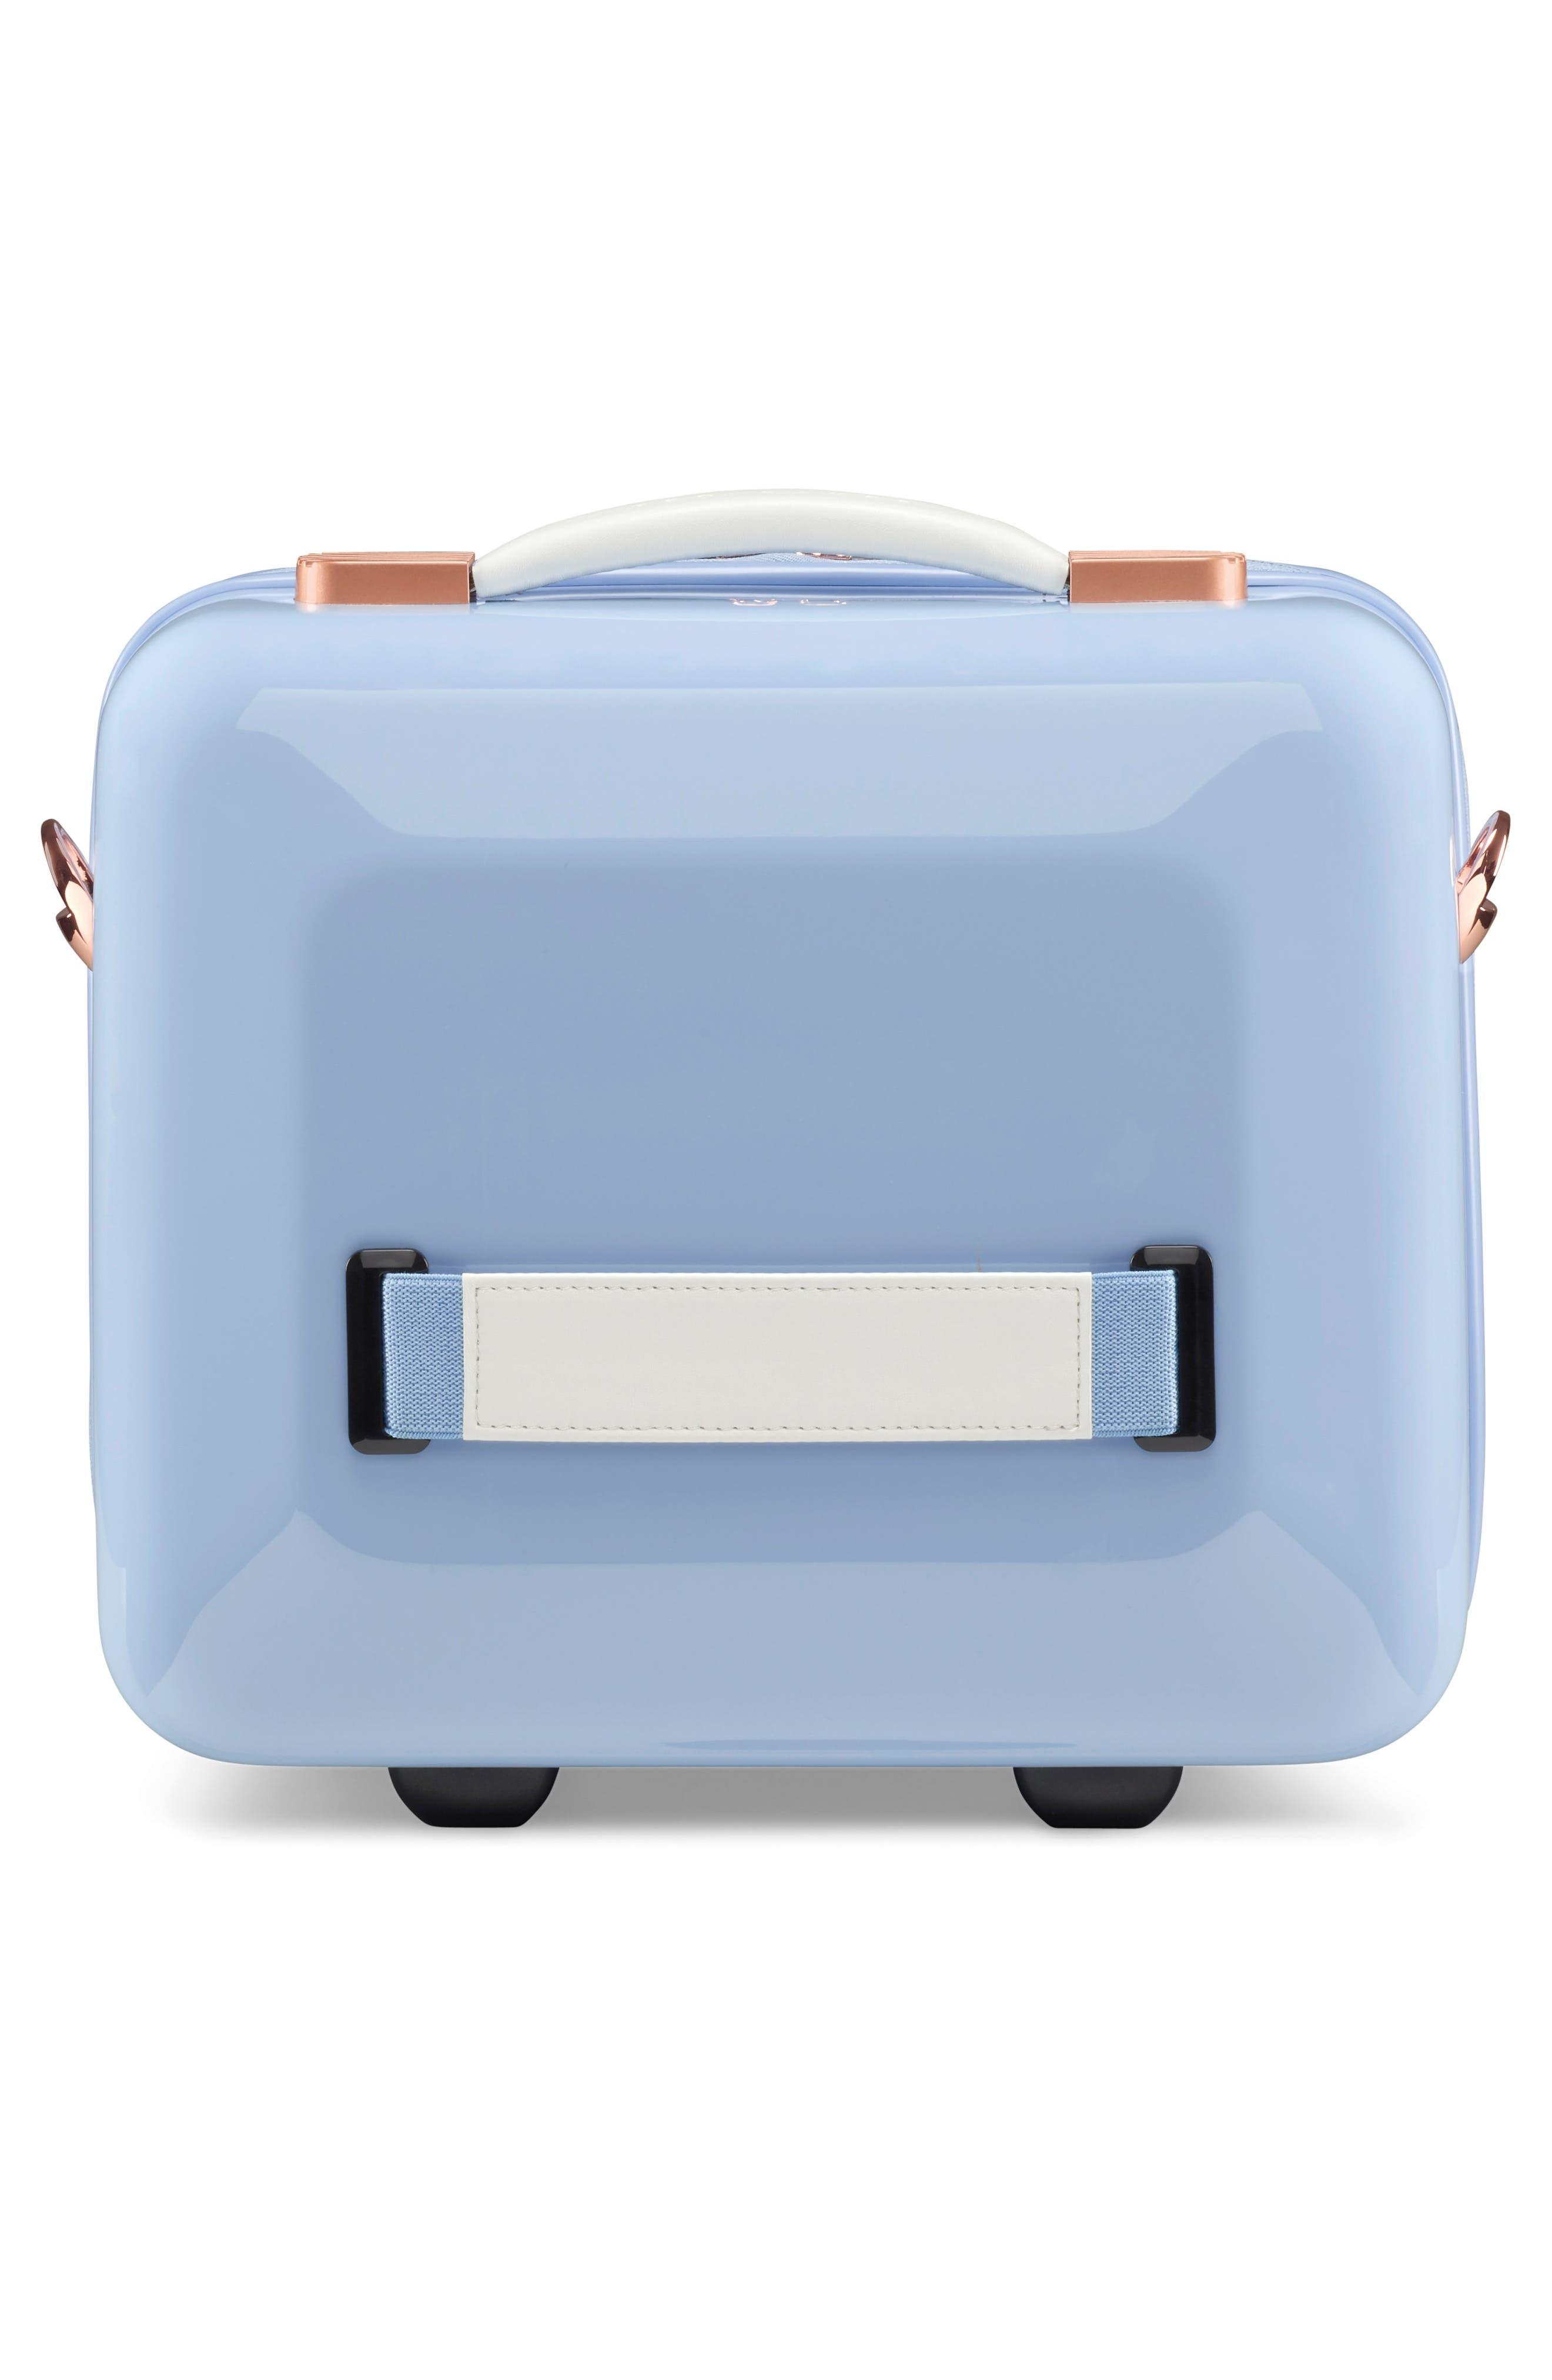 TED BAKER LONDON, Harmony Print Vanity Case, Alternate thumbnail 4, color, BLUE